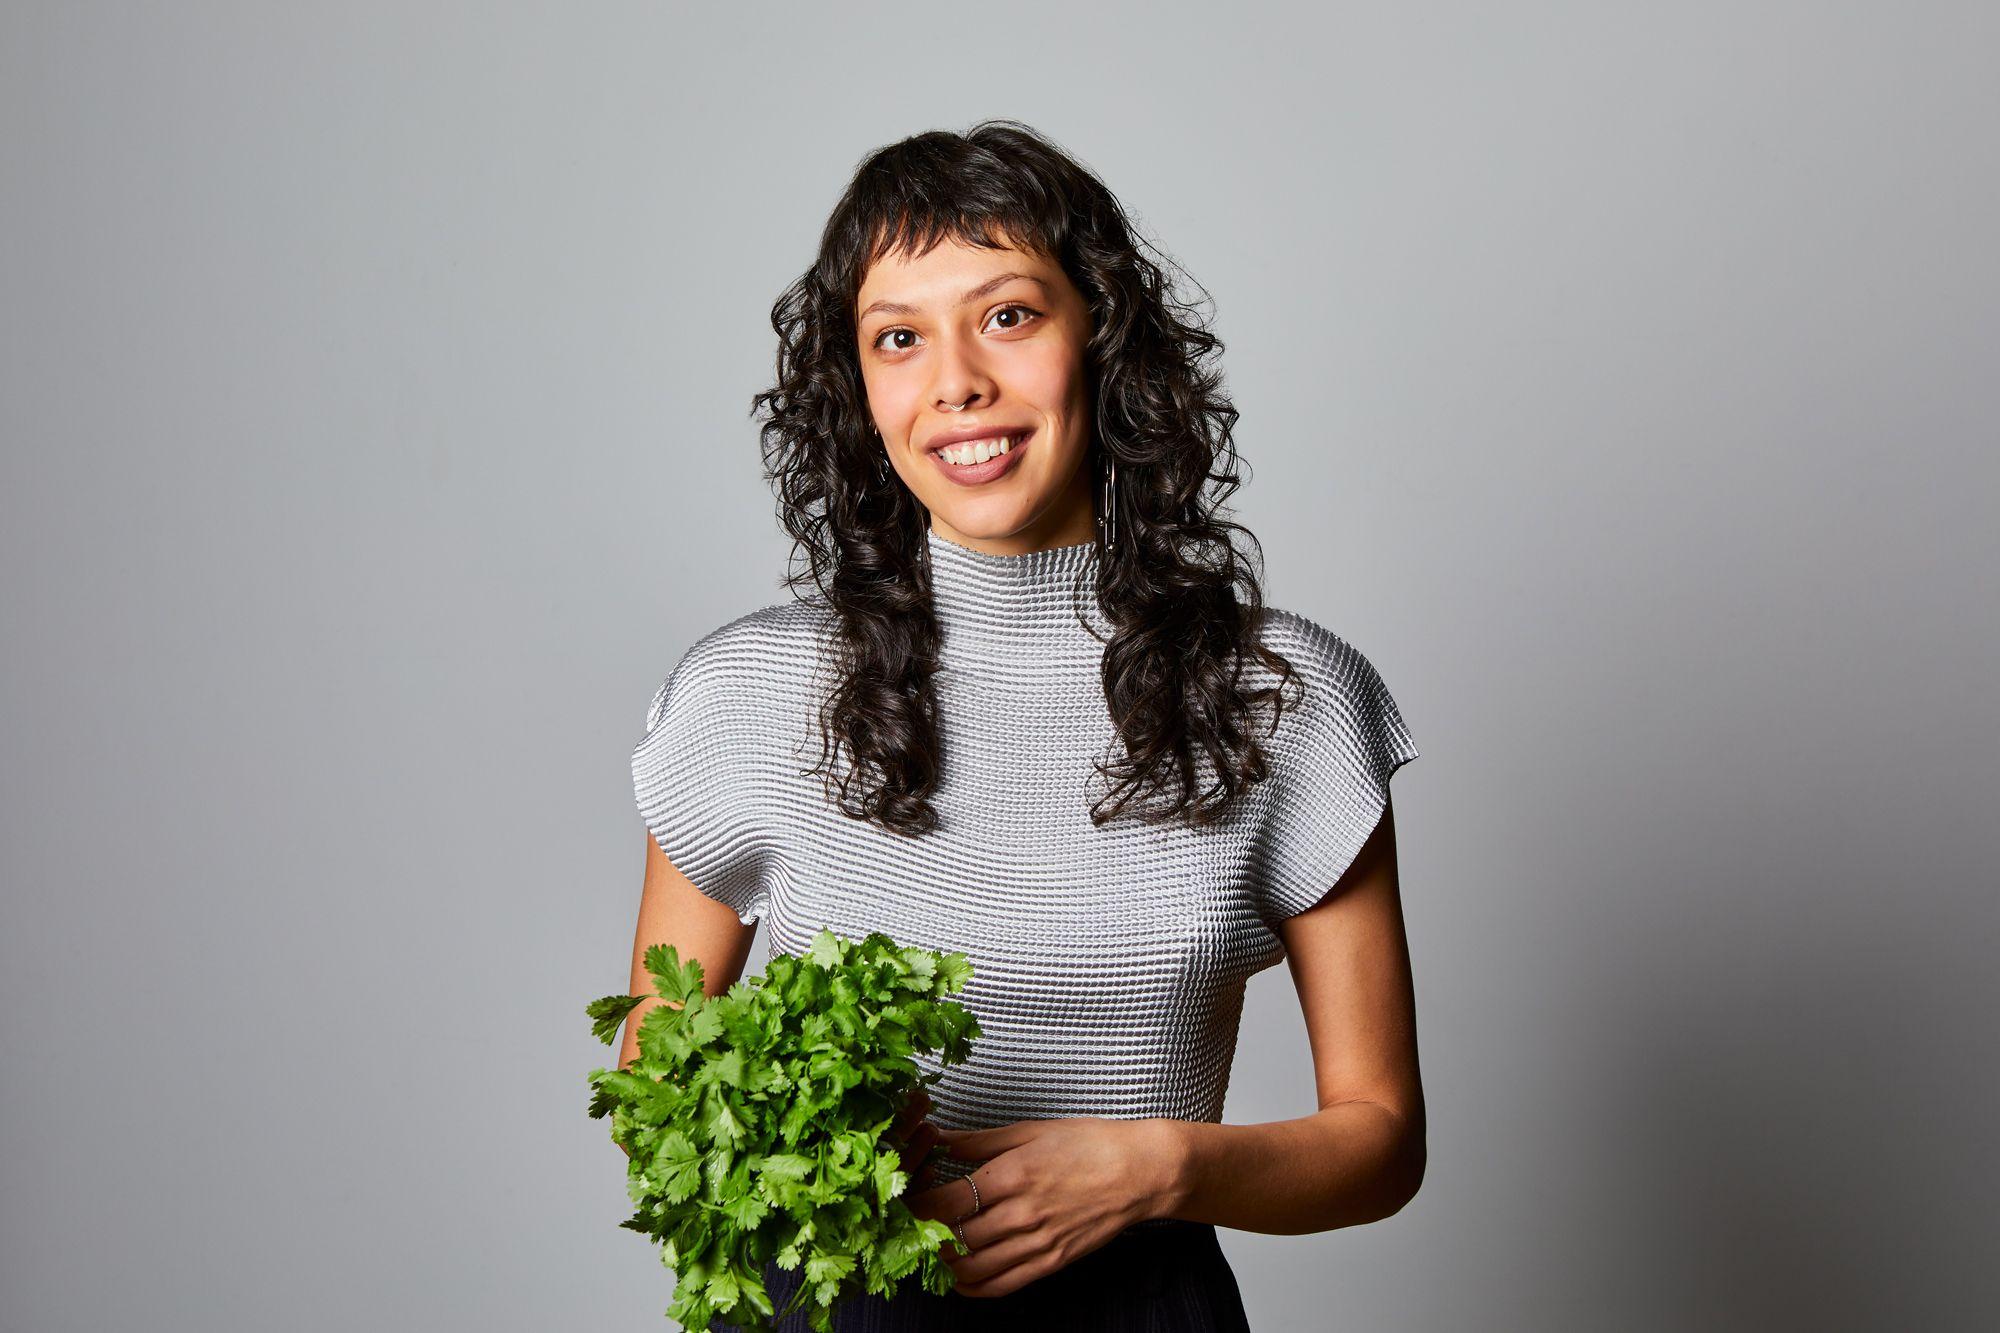 Kayla Roolaart